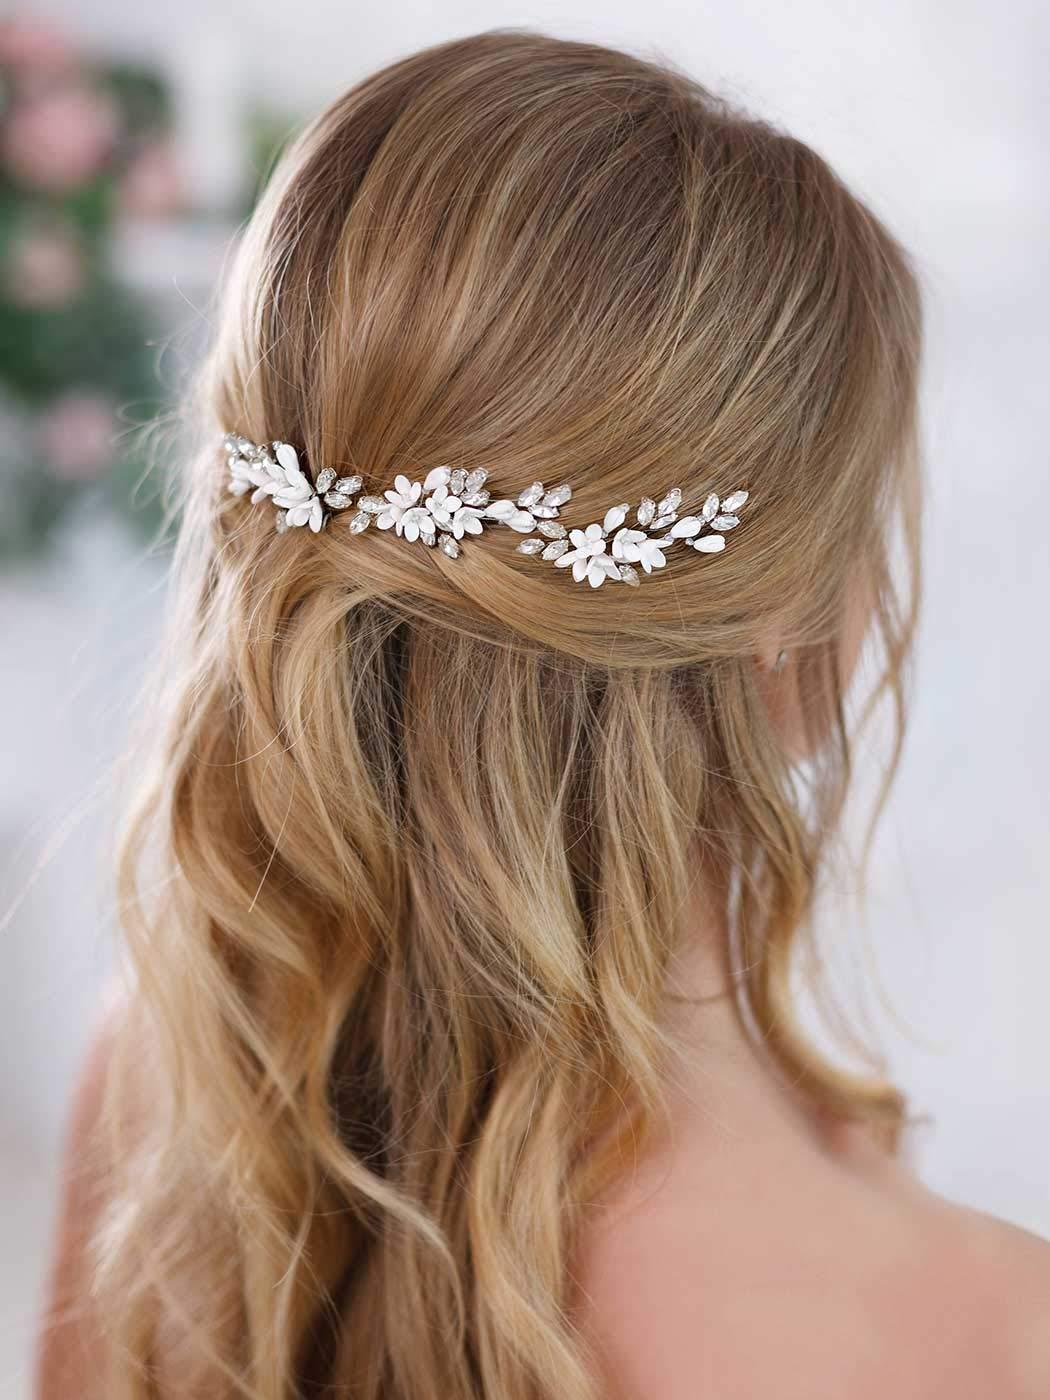 Barogirl Bride White Flower Wedding Hair Pins Clips Rhinestone Silver Bridal Hair Piece Accessories for Women, Set of 3 by Barogirl